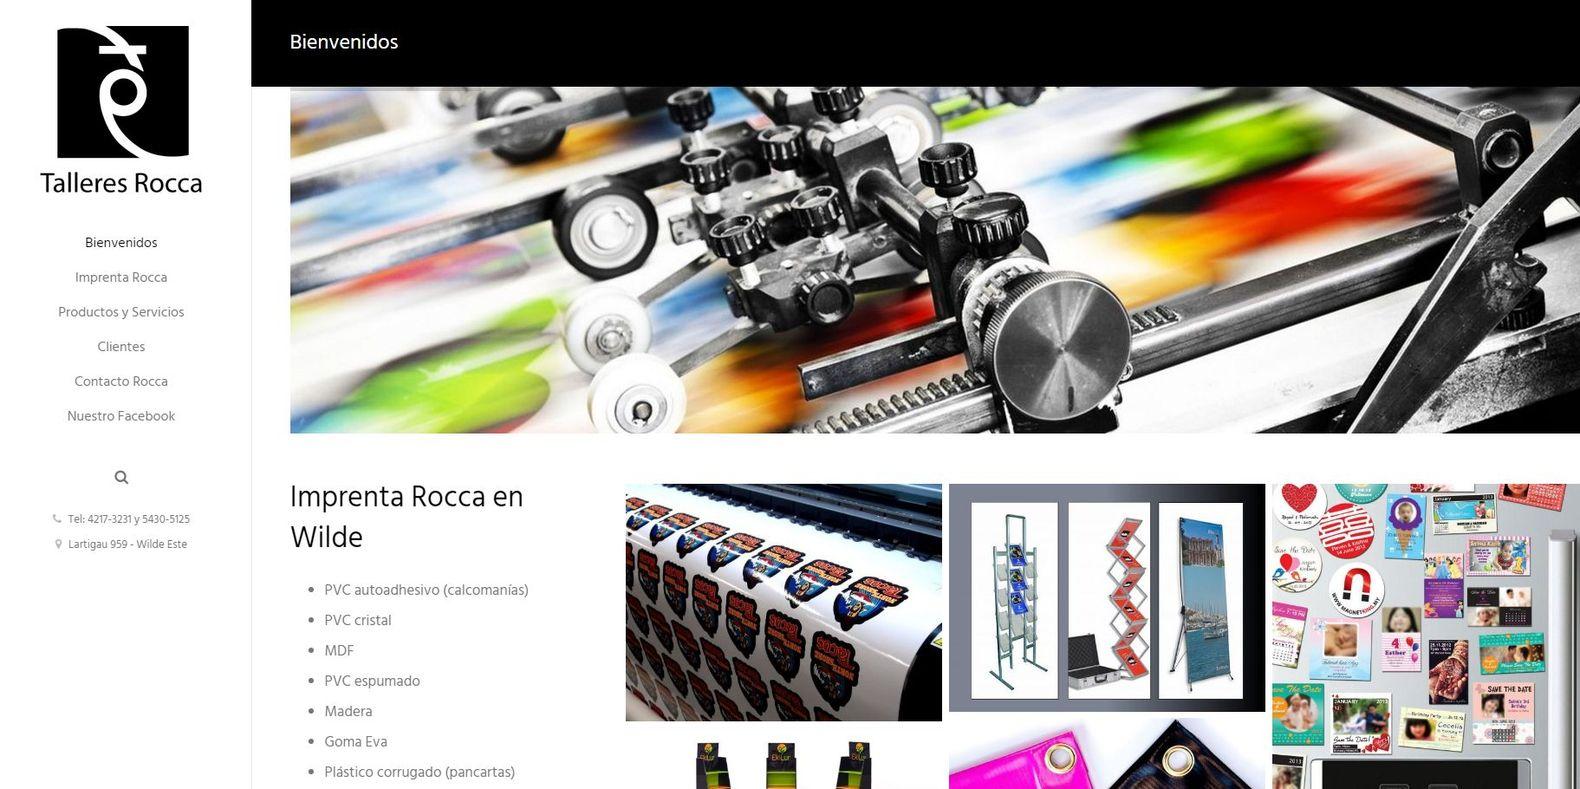 imprenta-rocca-grafica-wilde-svnets